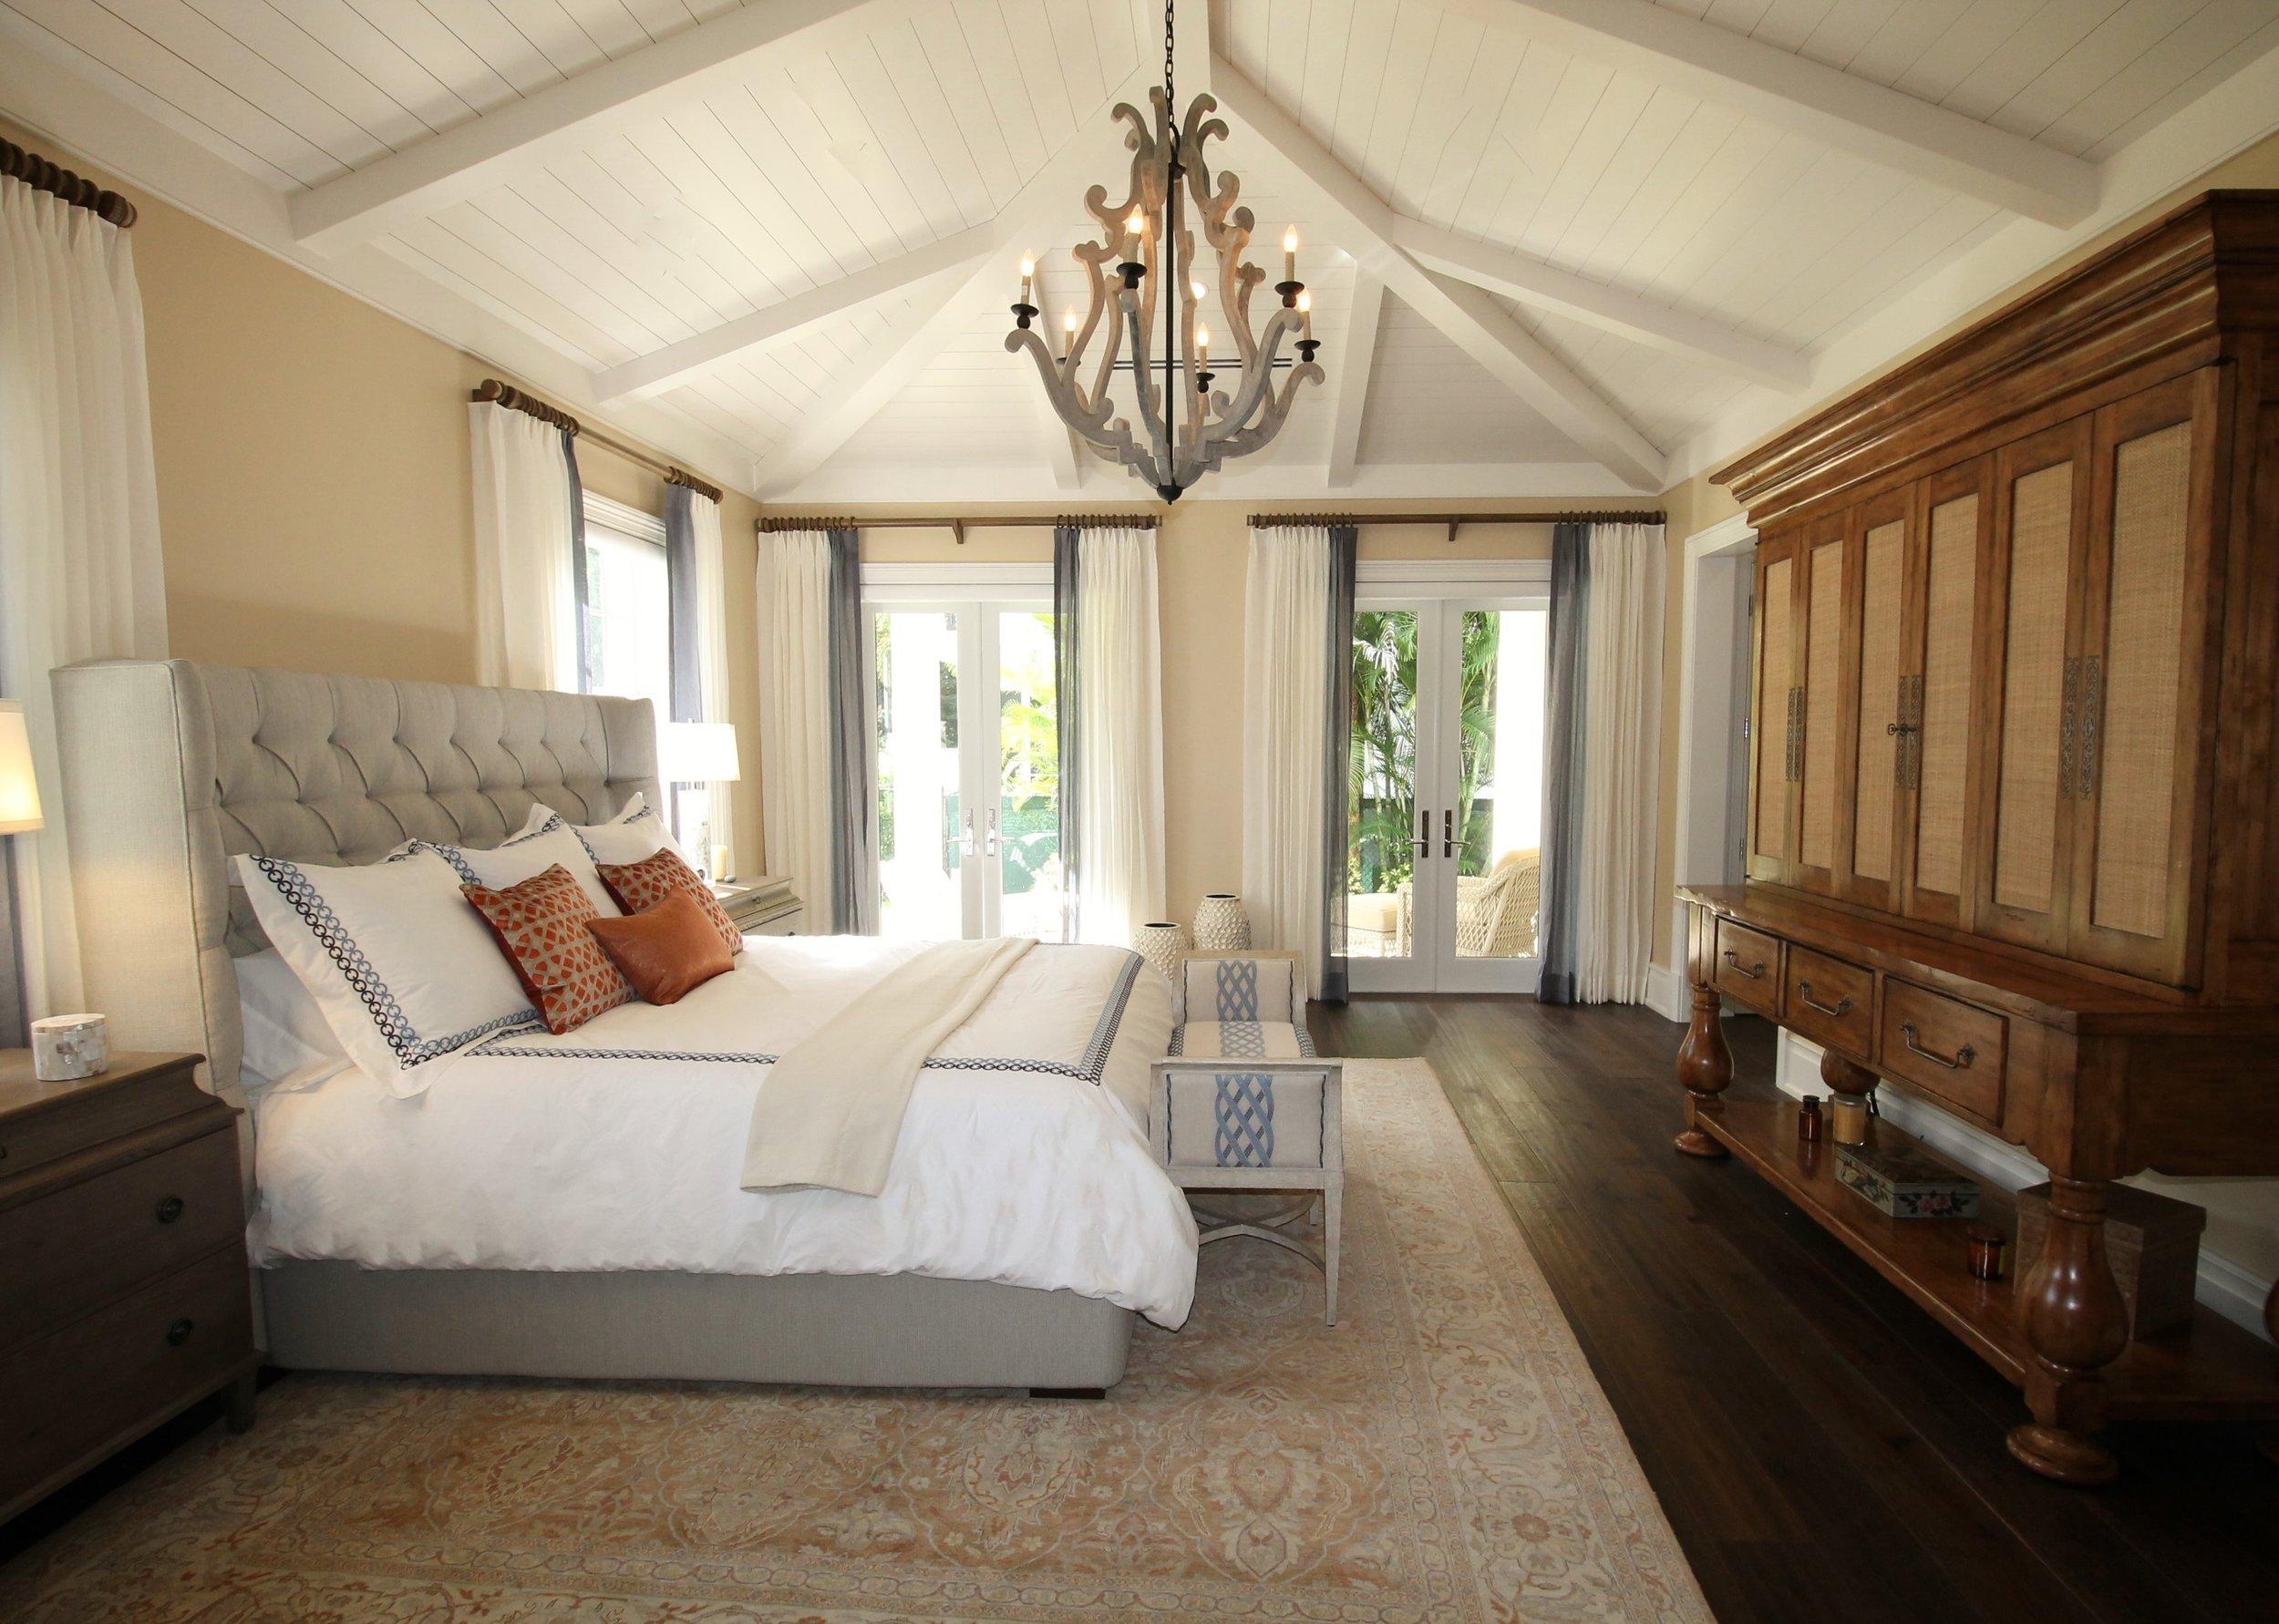 room home house bedroom bed.jpeg